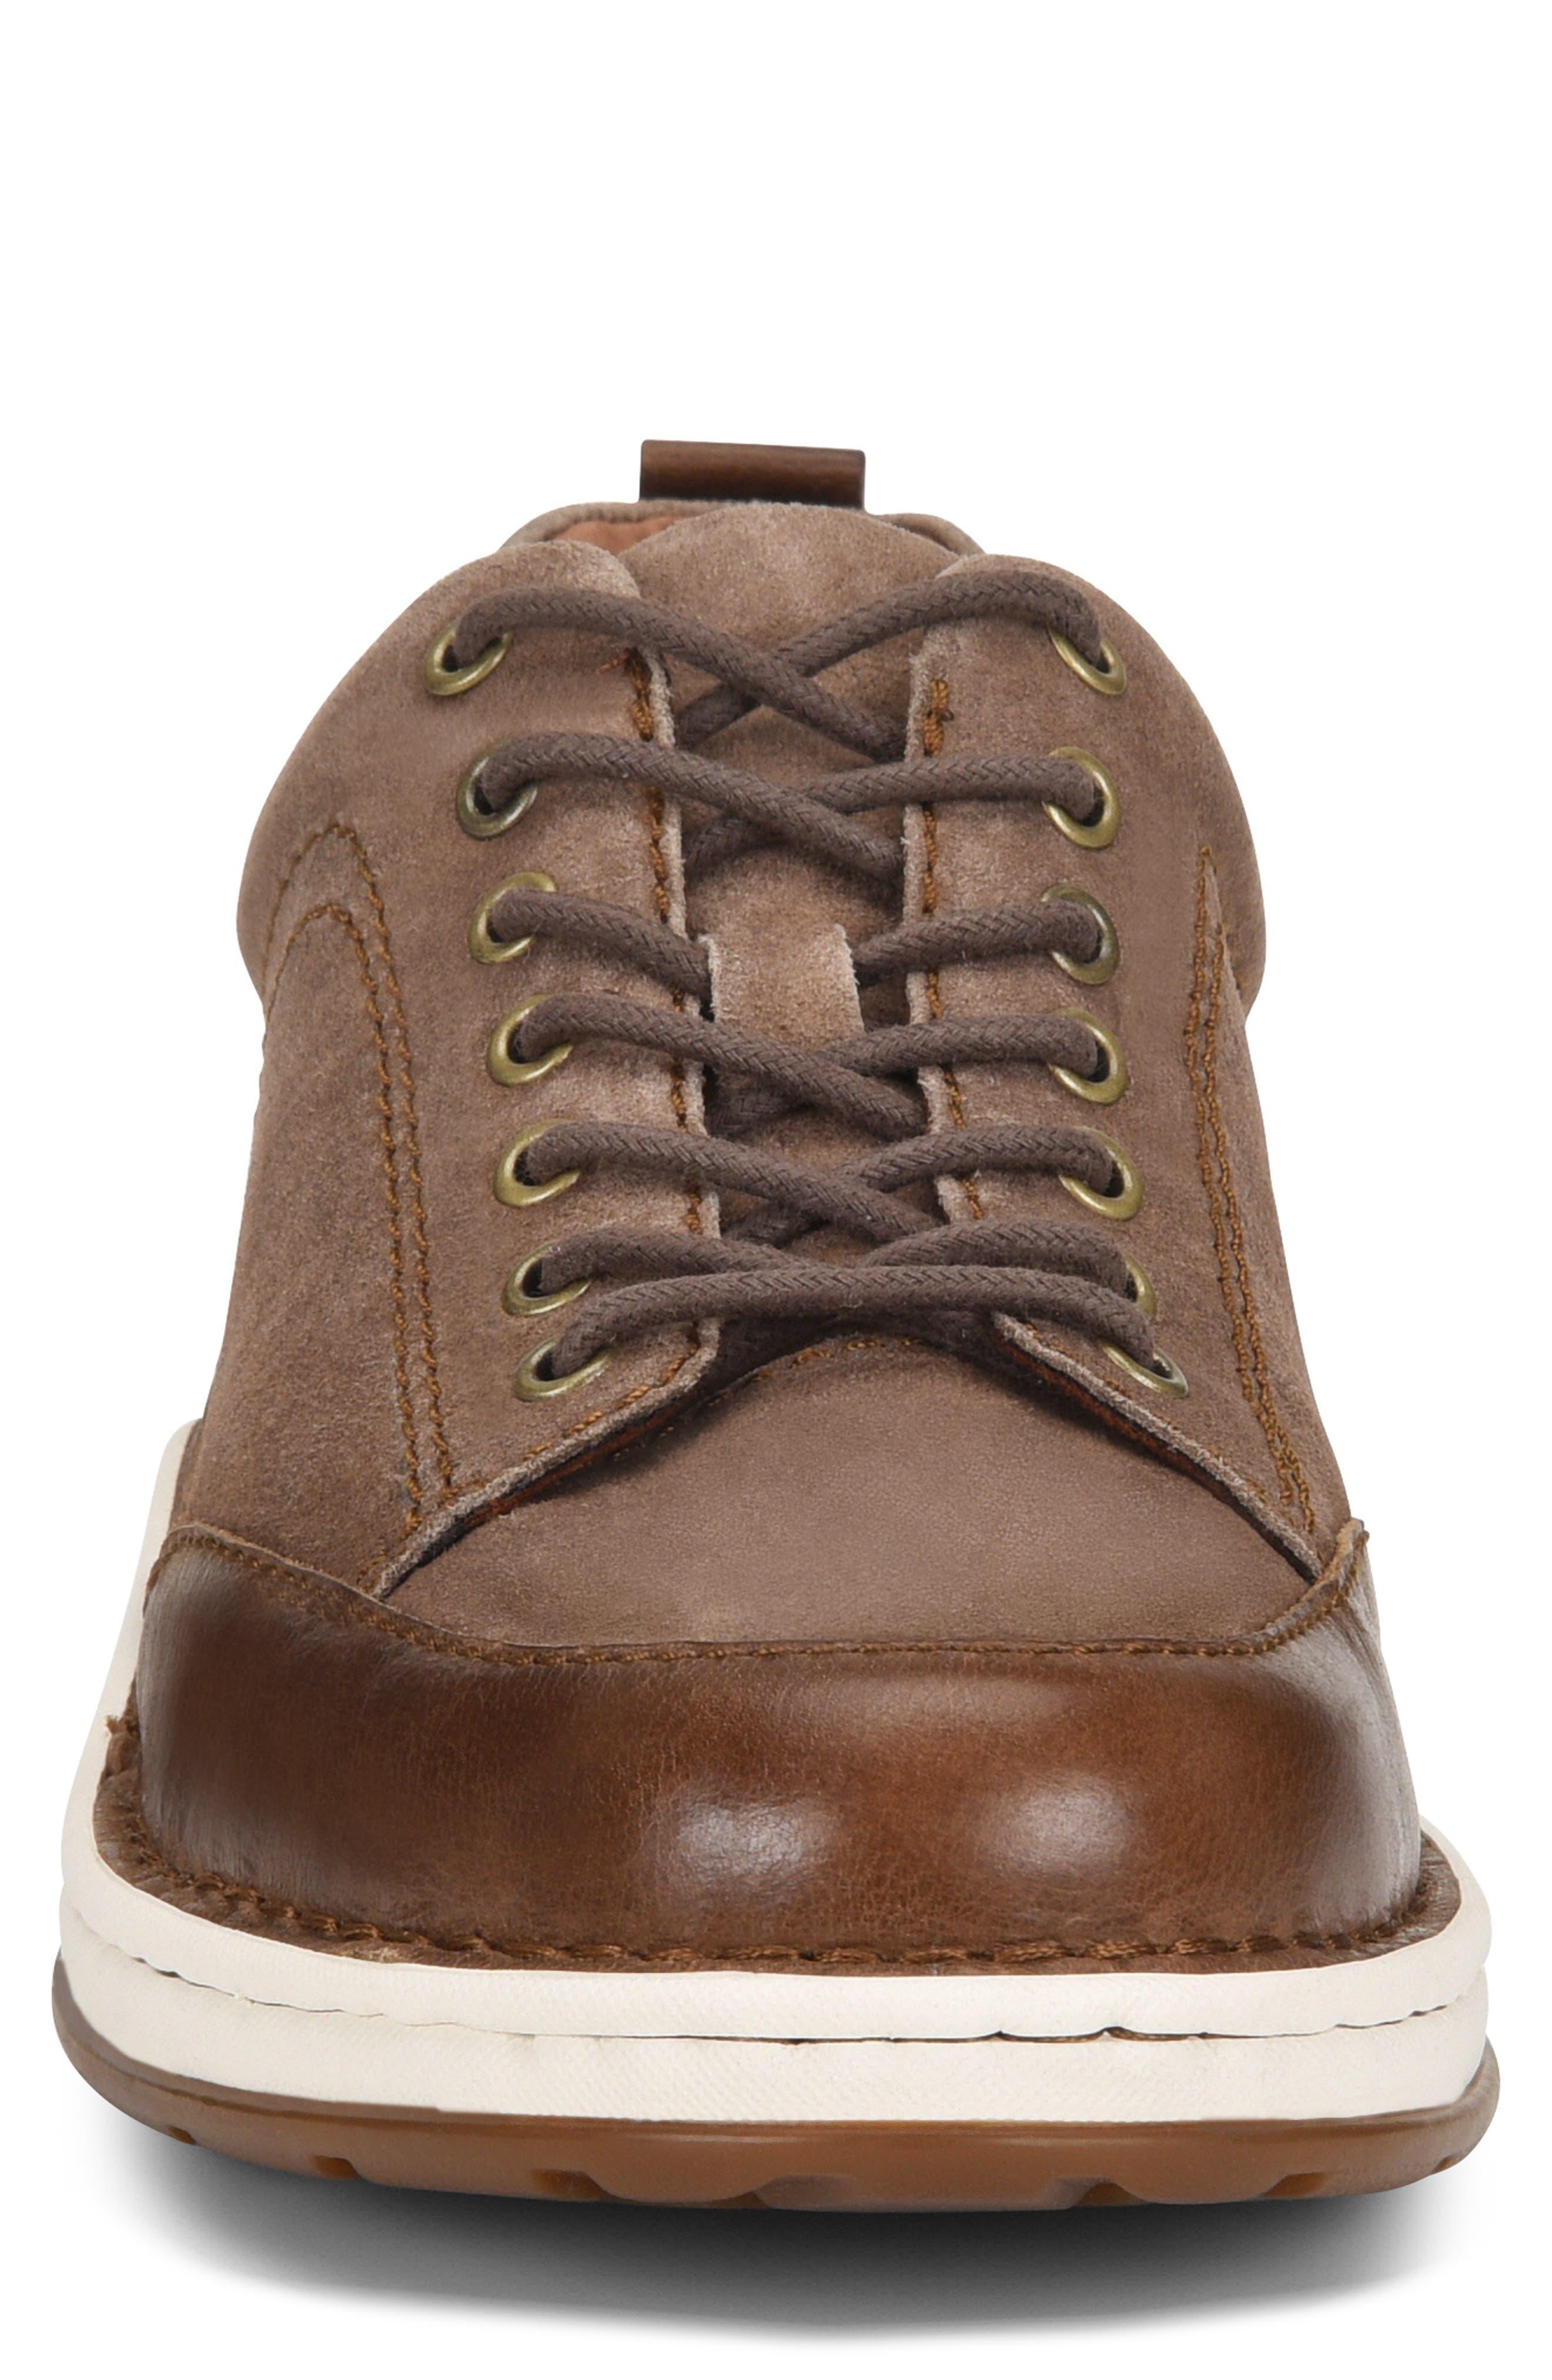 Kruger Moc Toe Sneaker,                             Alternate thumbnail 4, color,                             TAUPE LEATHER